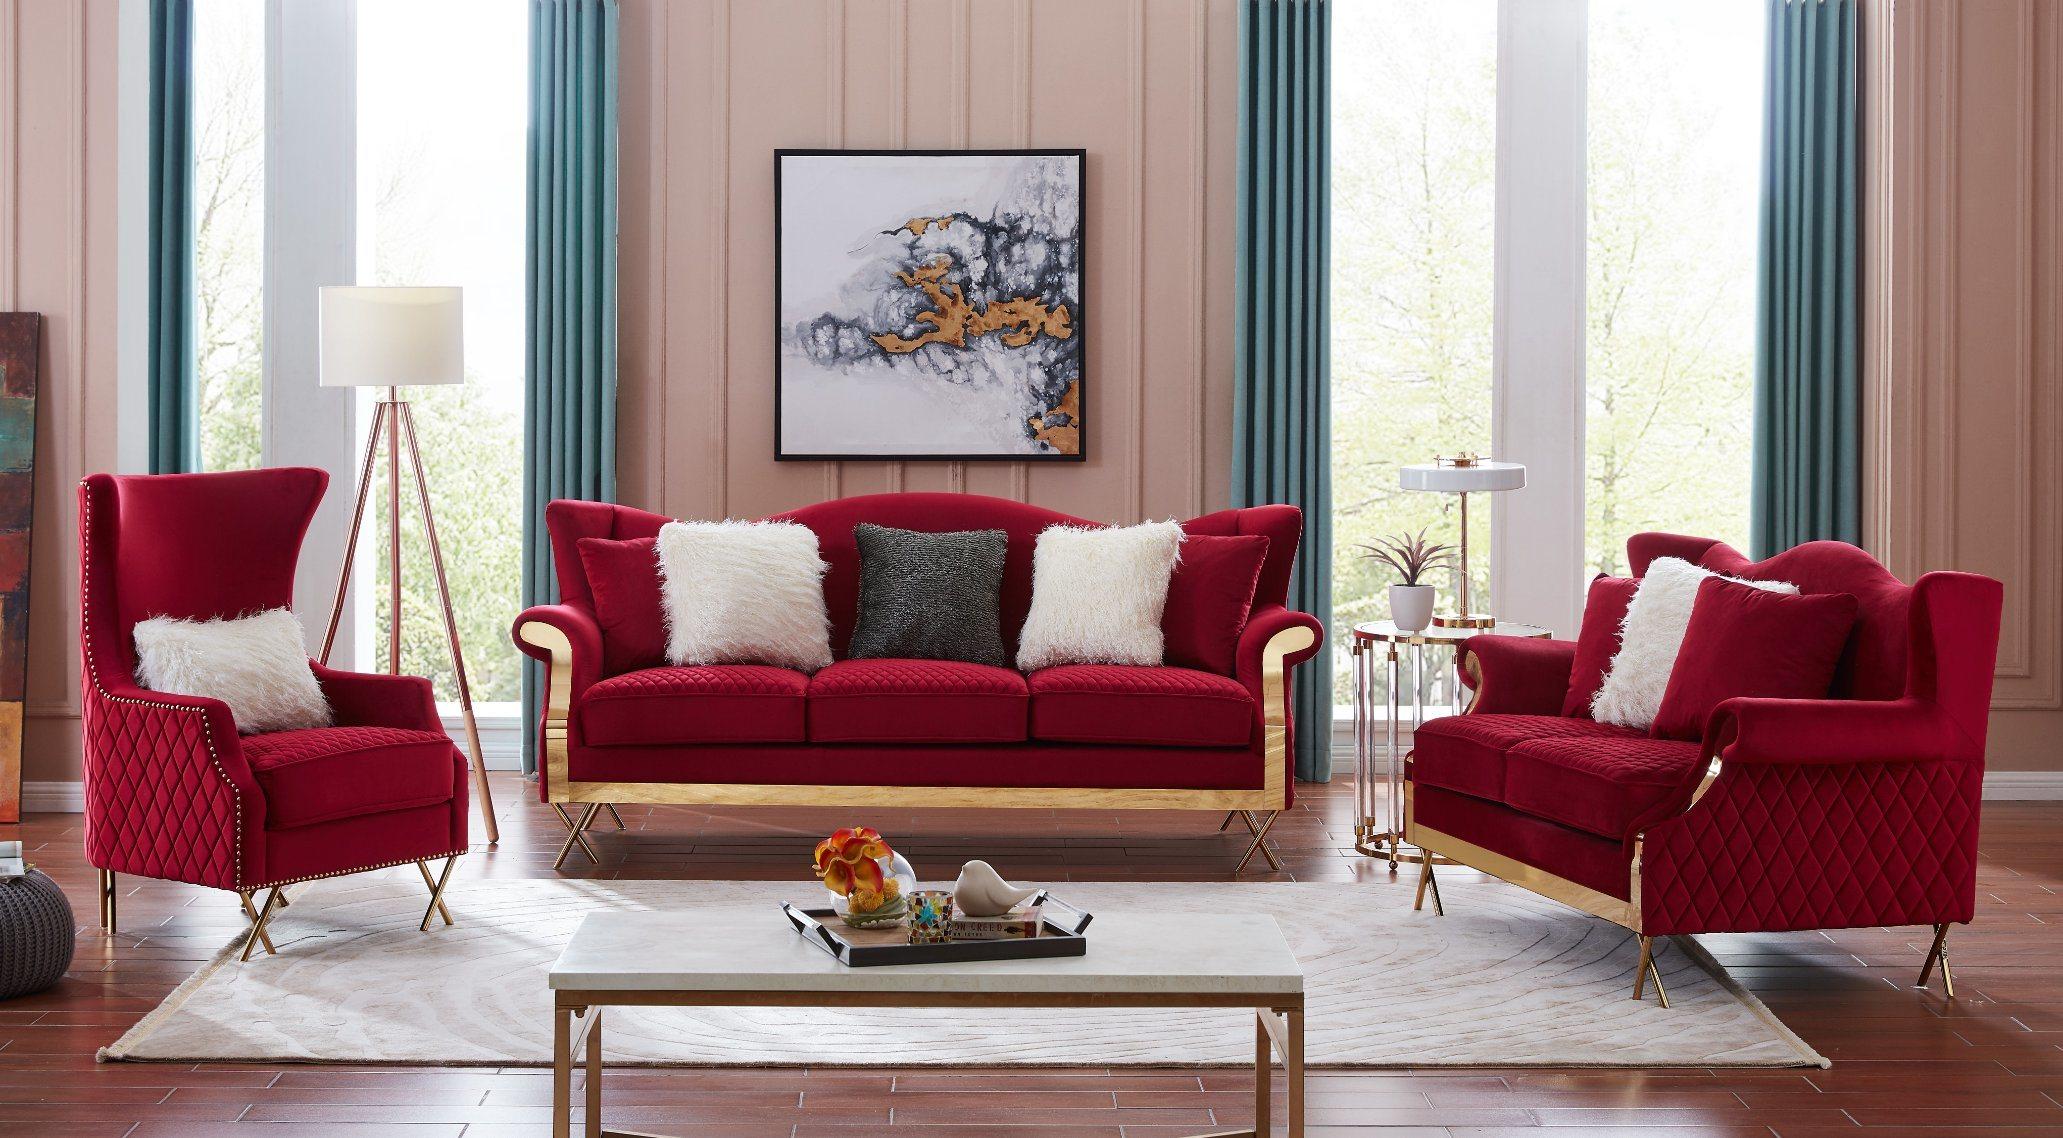 China American Light Luxury Stainless Steel Modern Red Velvet Sofa China Hotel Furniture Home Sofa